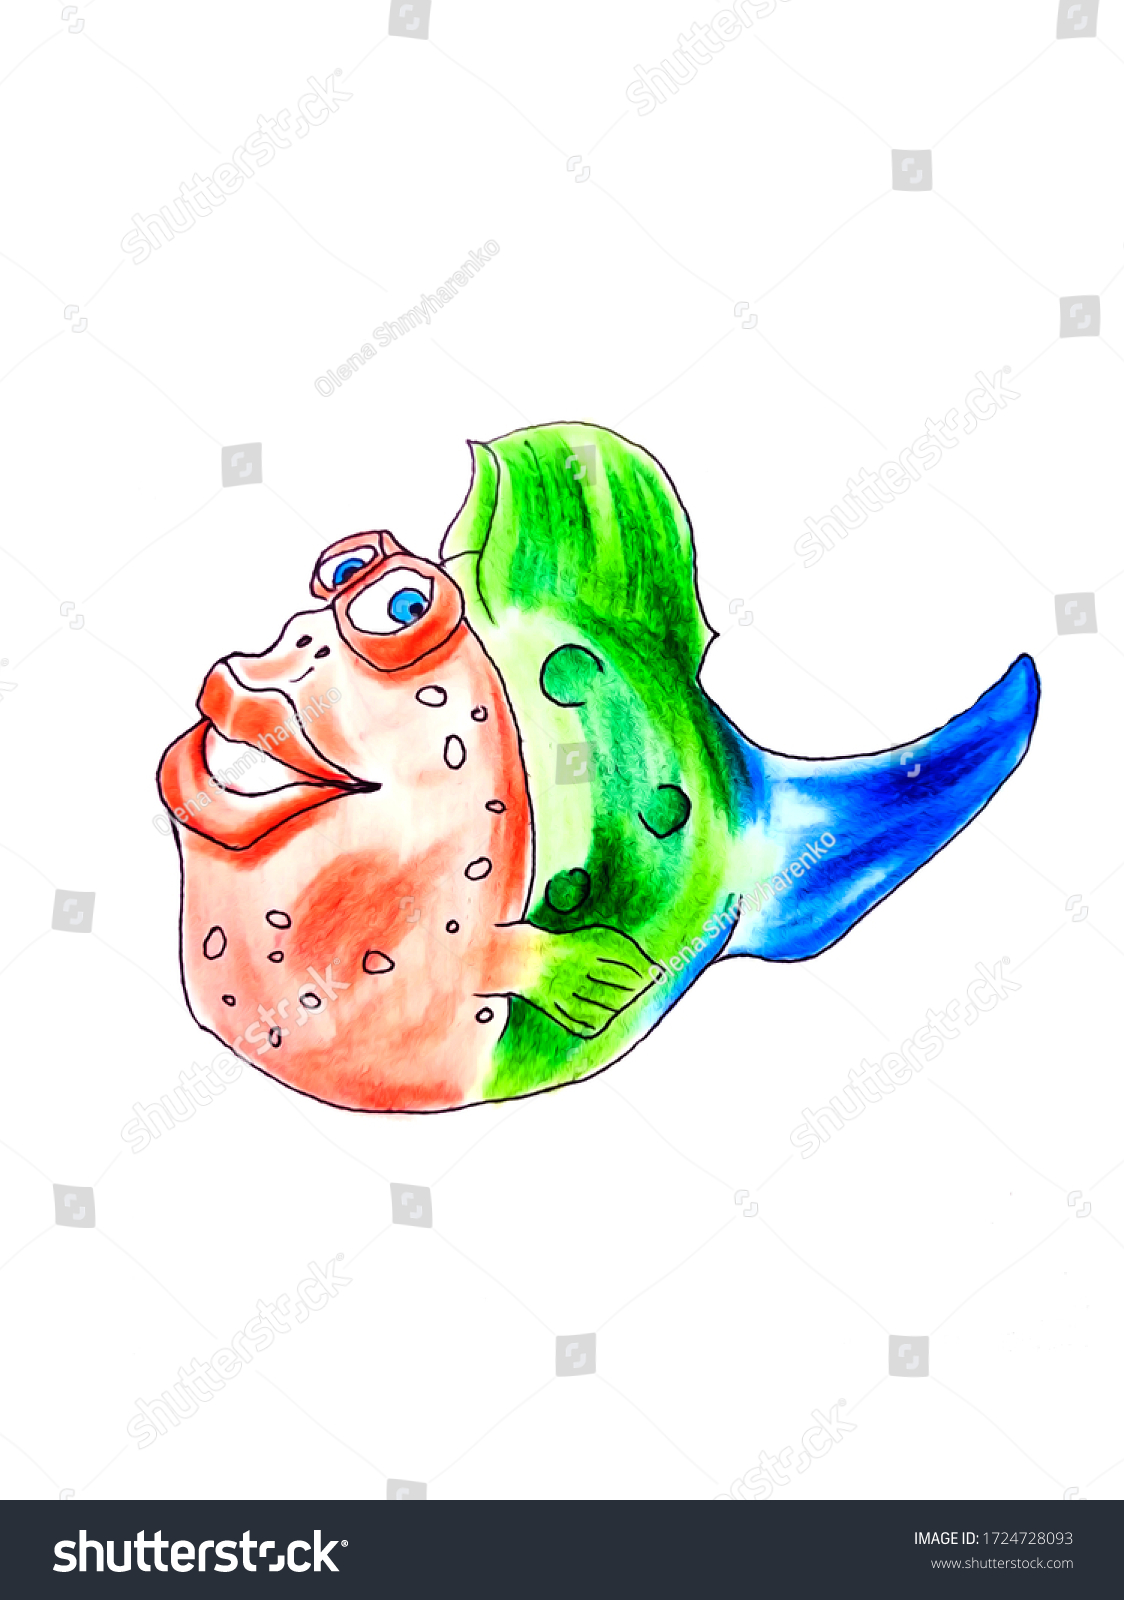 Big Lips Cartoon : cartoon, Funny, Cartoon, Stock, Illustration, 1724728093